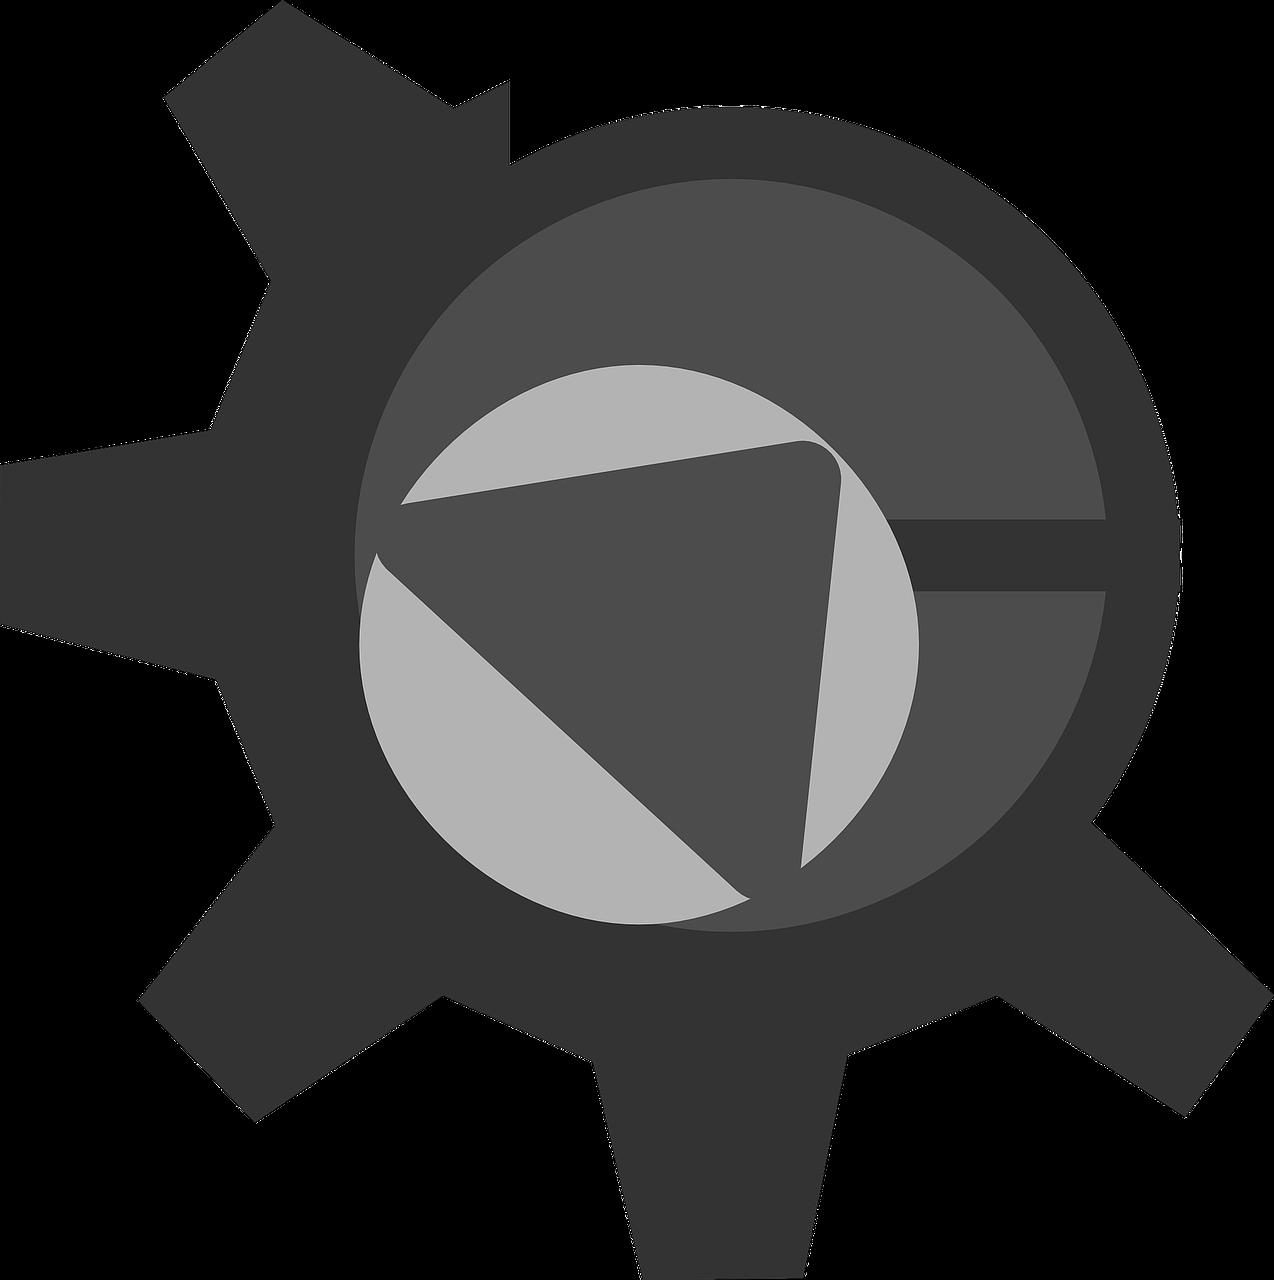 Develop sign png image. Gear clipart development